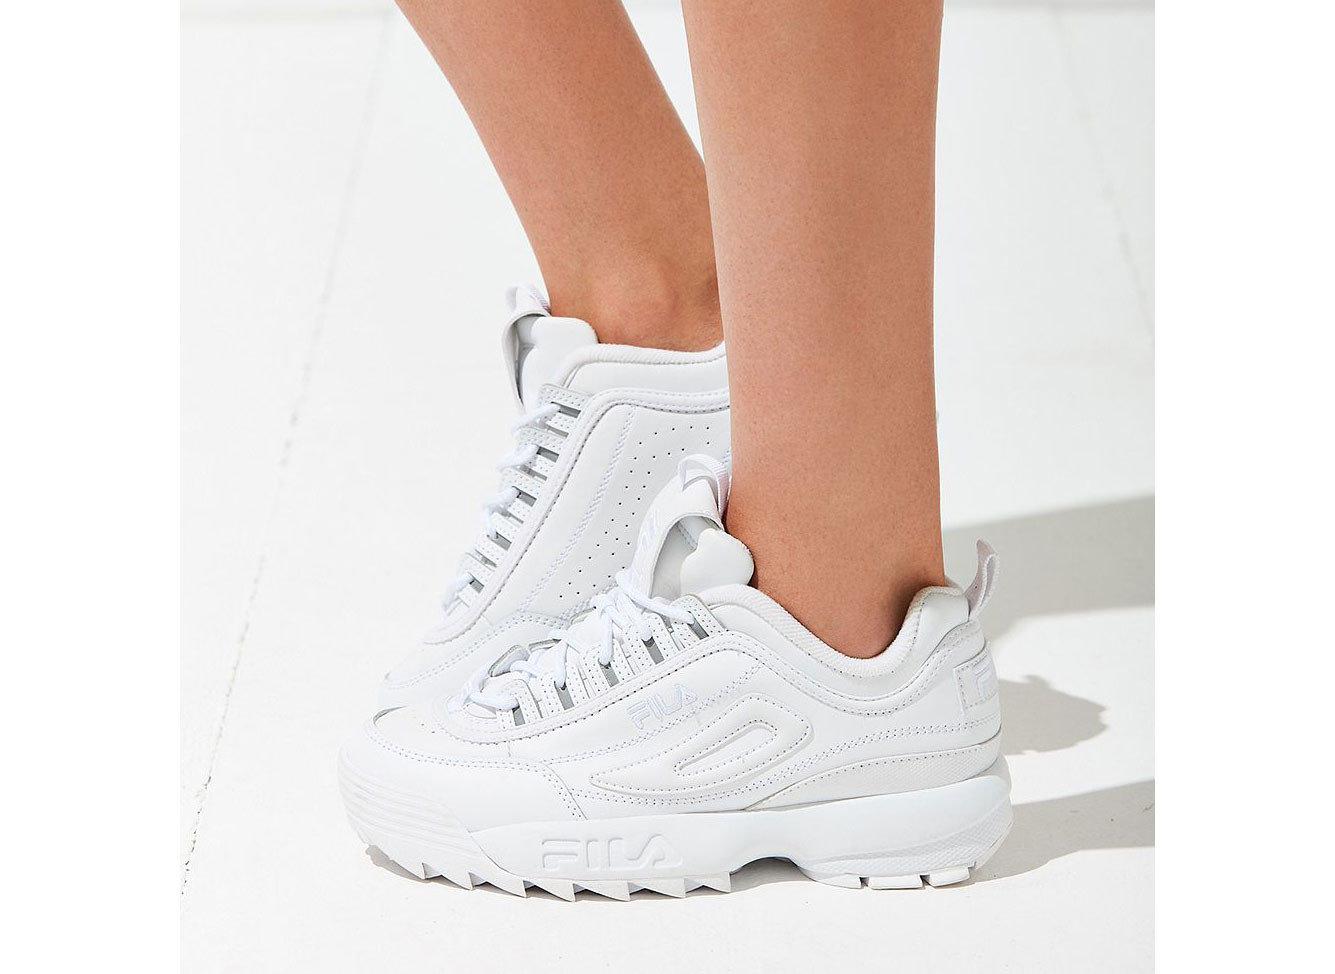 Celebs Style + Design Travel Shop footwear person shoe white sneakers clothing walking shoe sportswear outdoor shoe human leg product design product feet